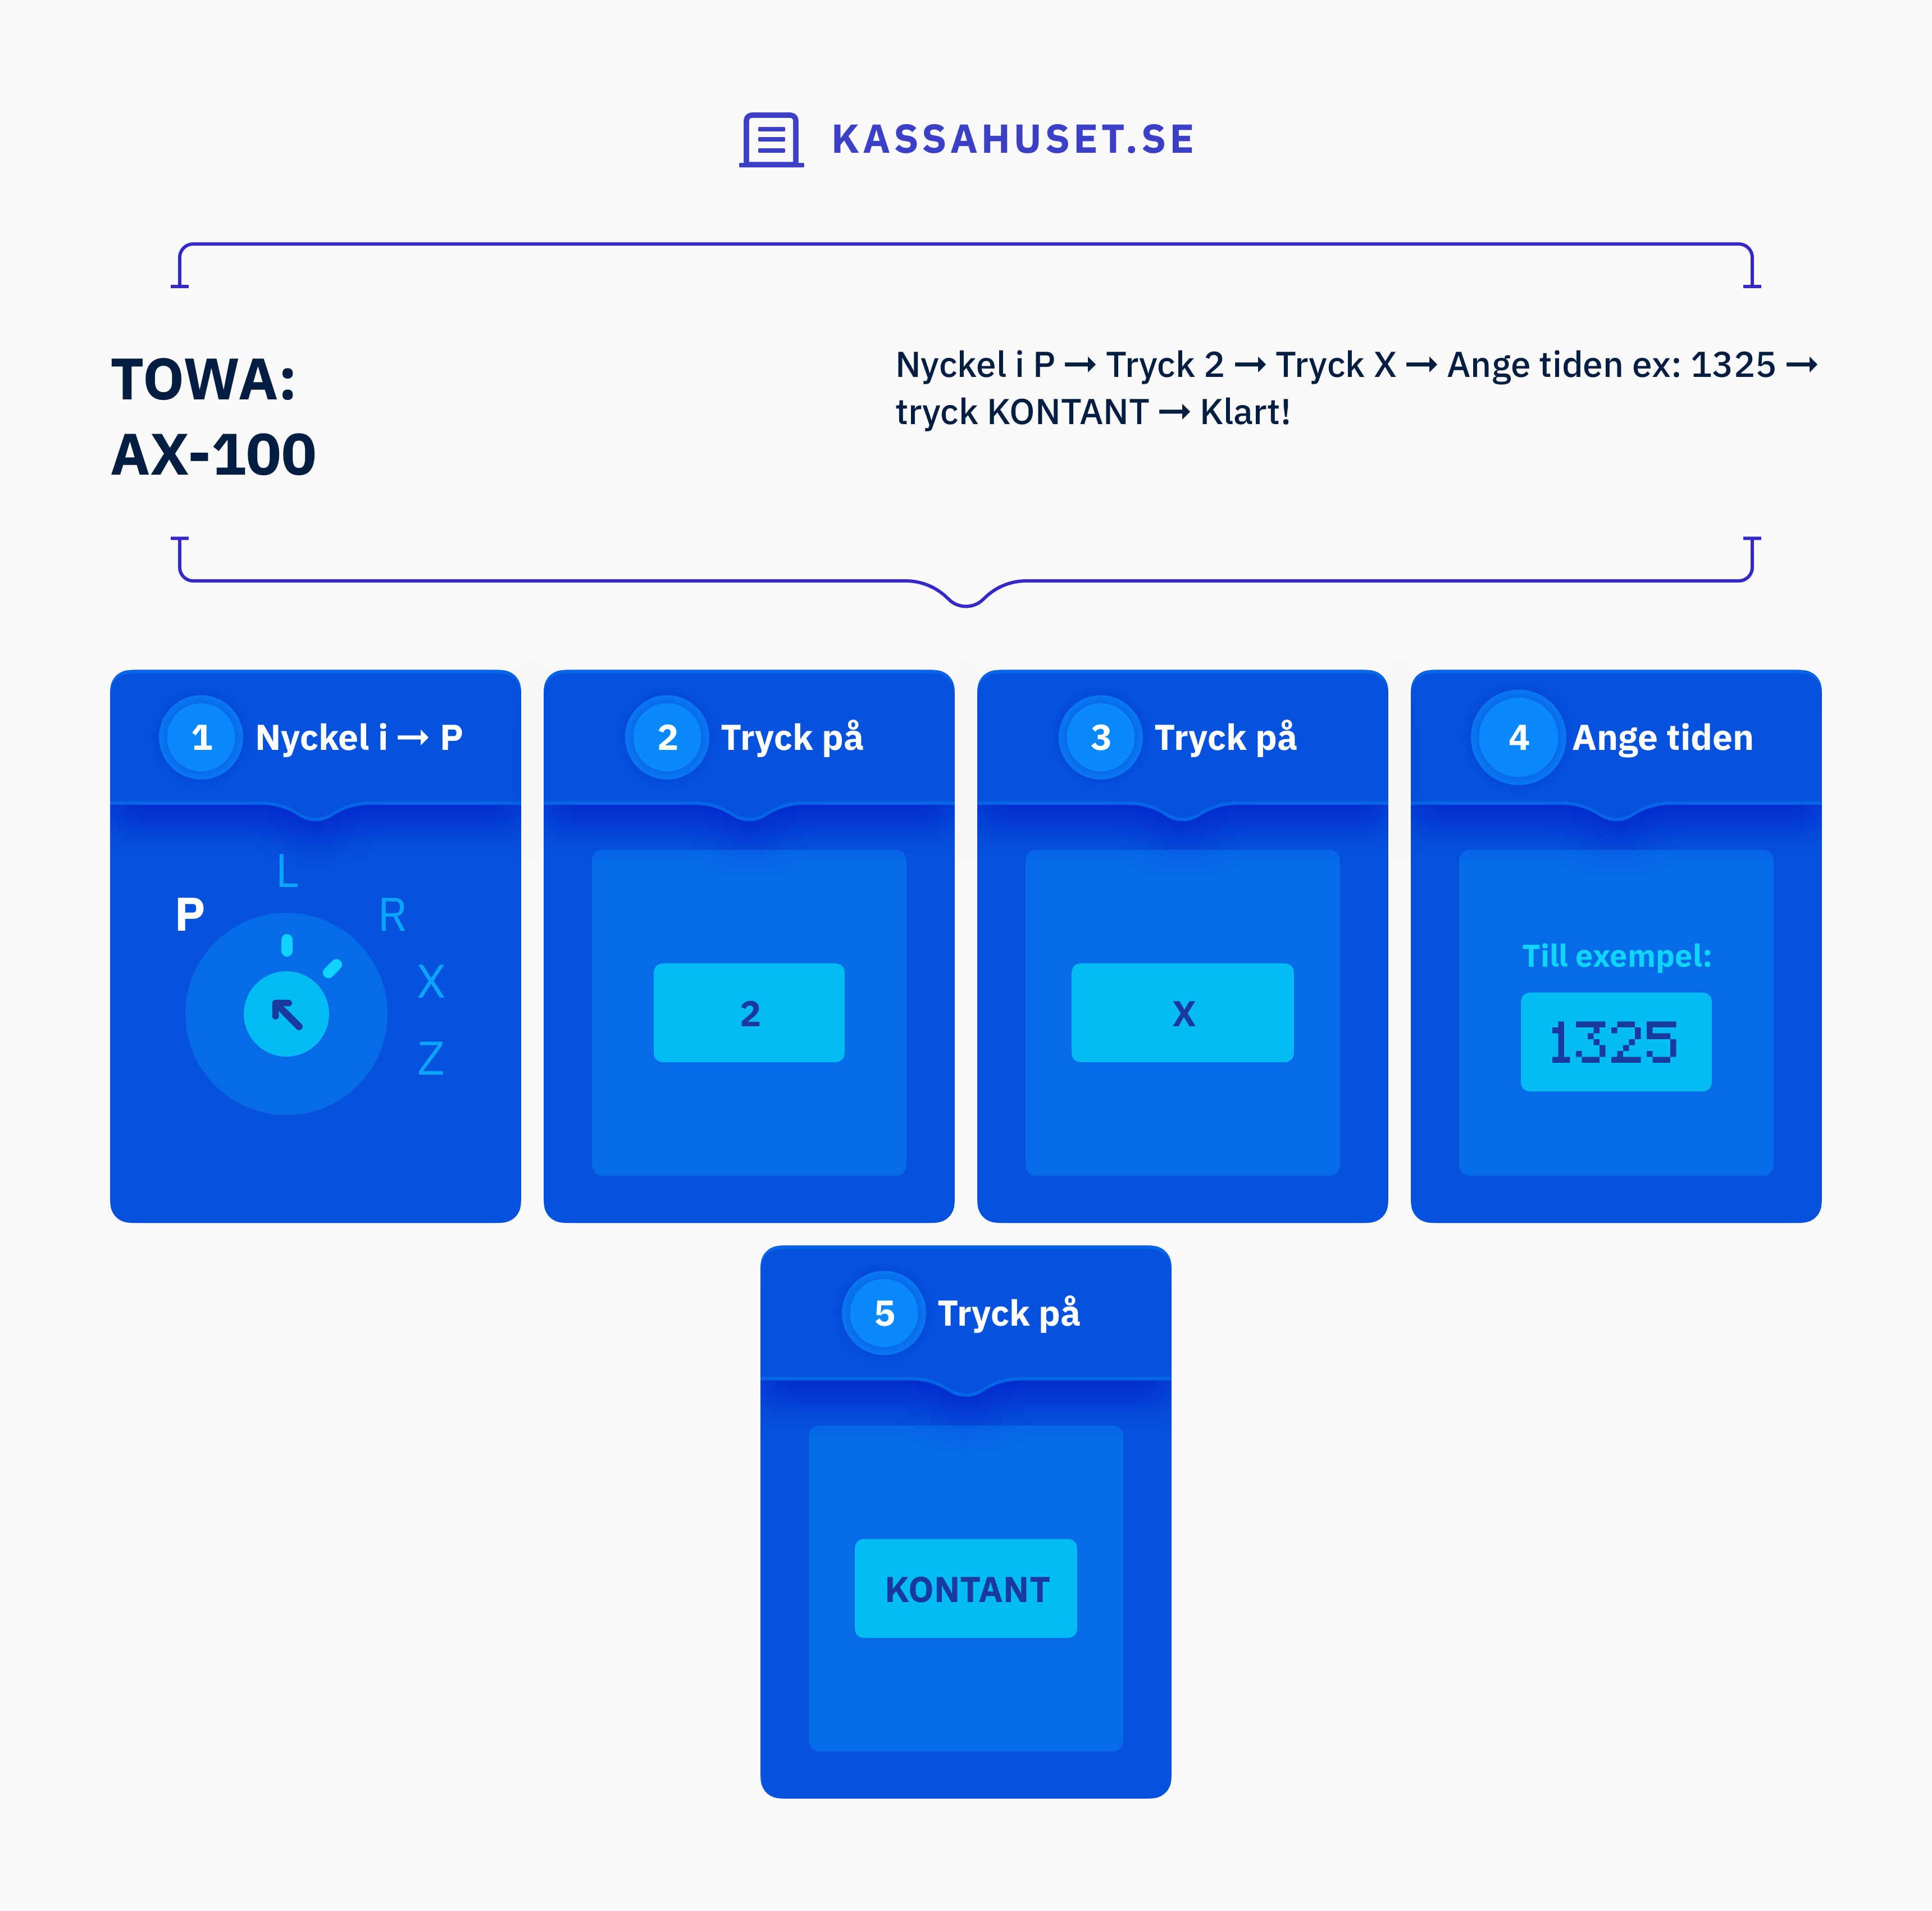 Ändra tiden i TOWA AX-100 kassaregister